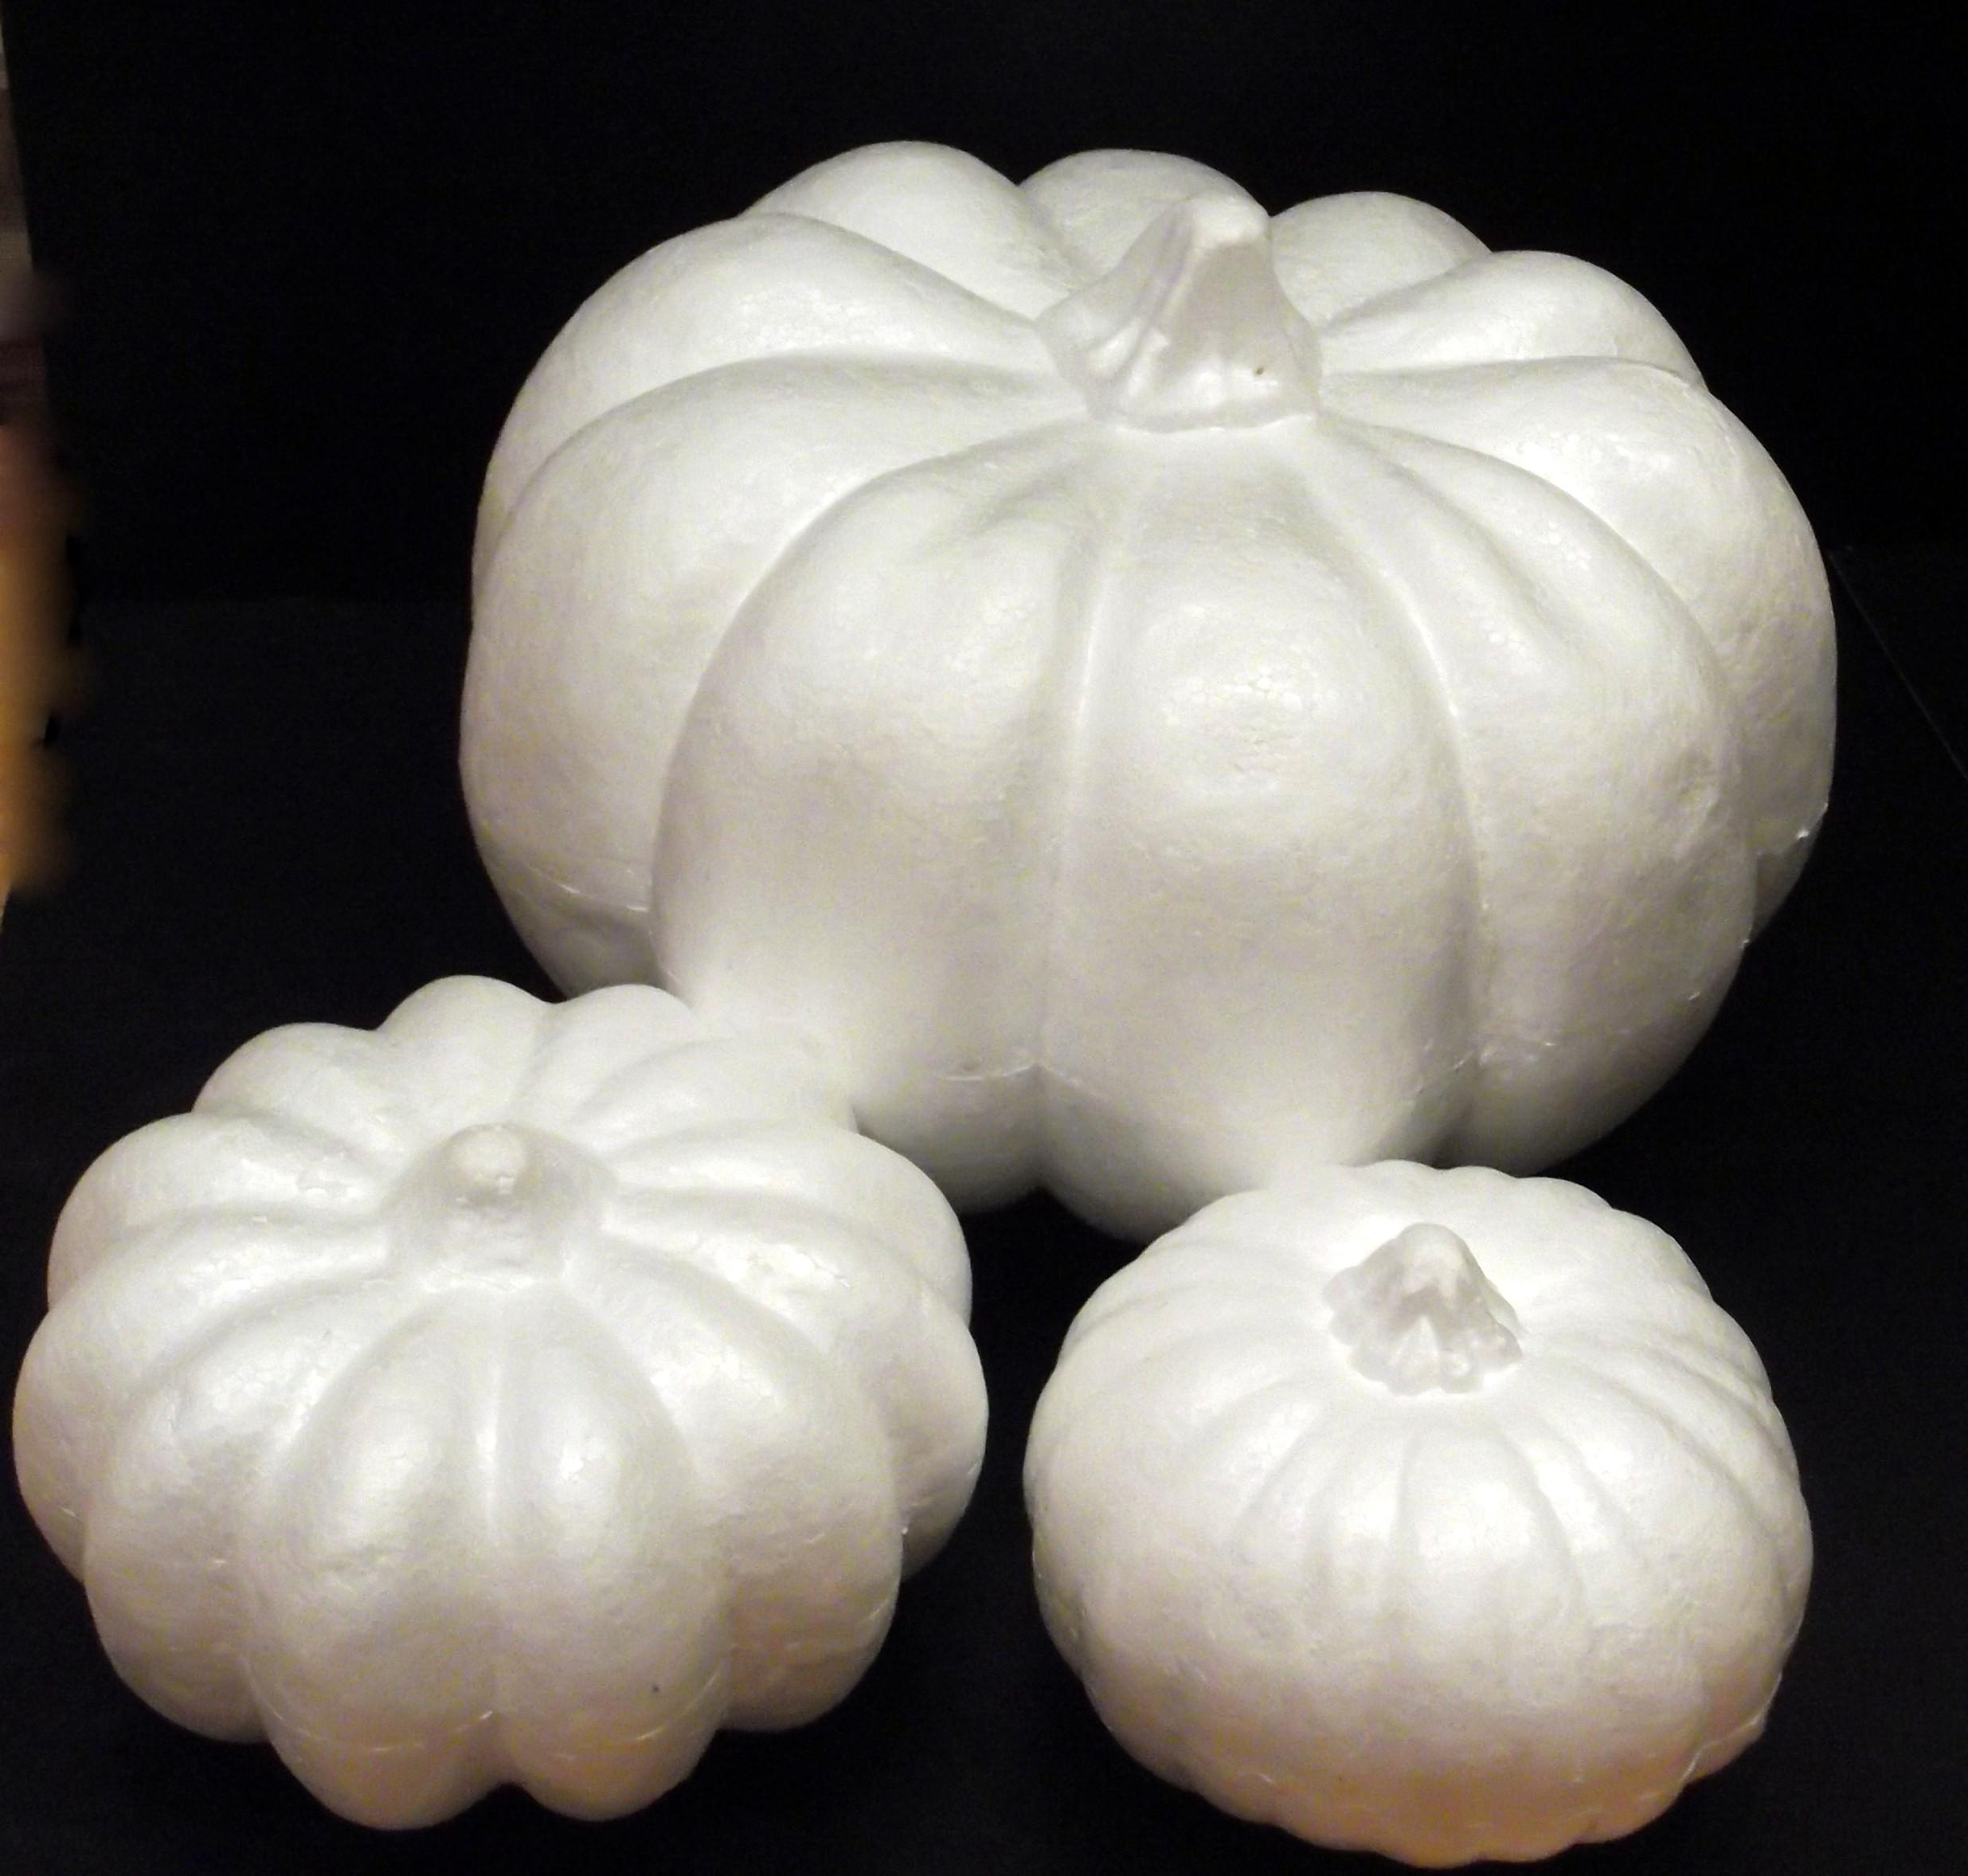 Polystyrene & Papier Mache Pumpkins